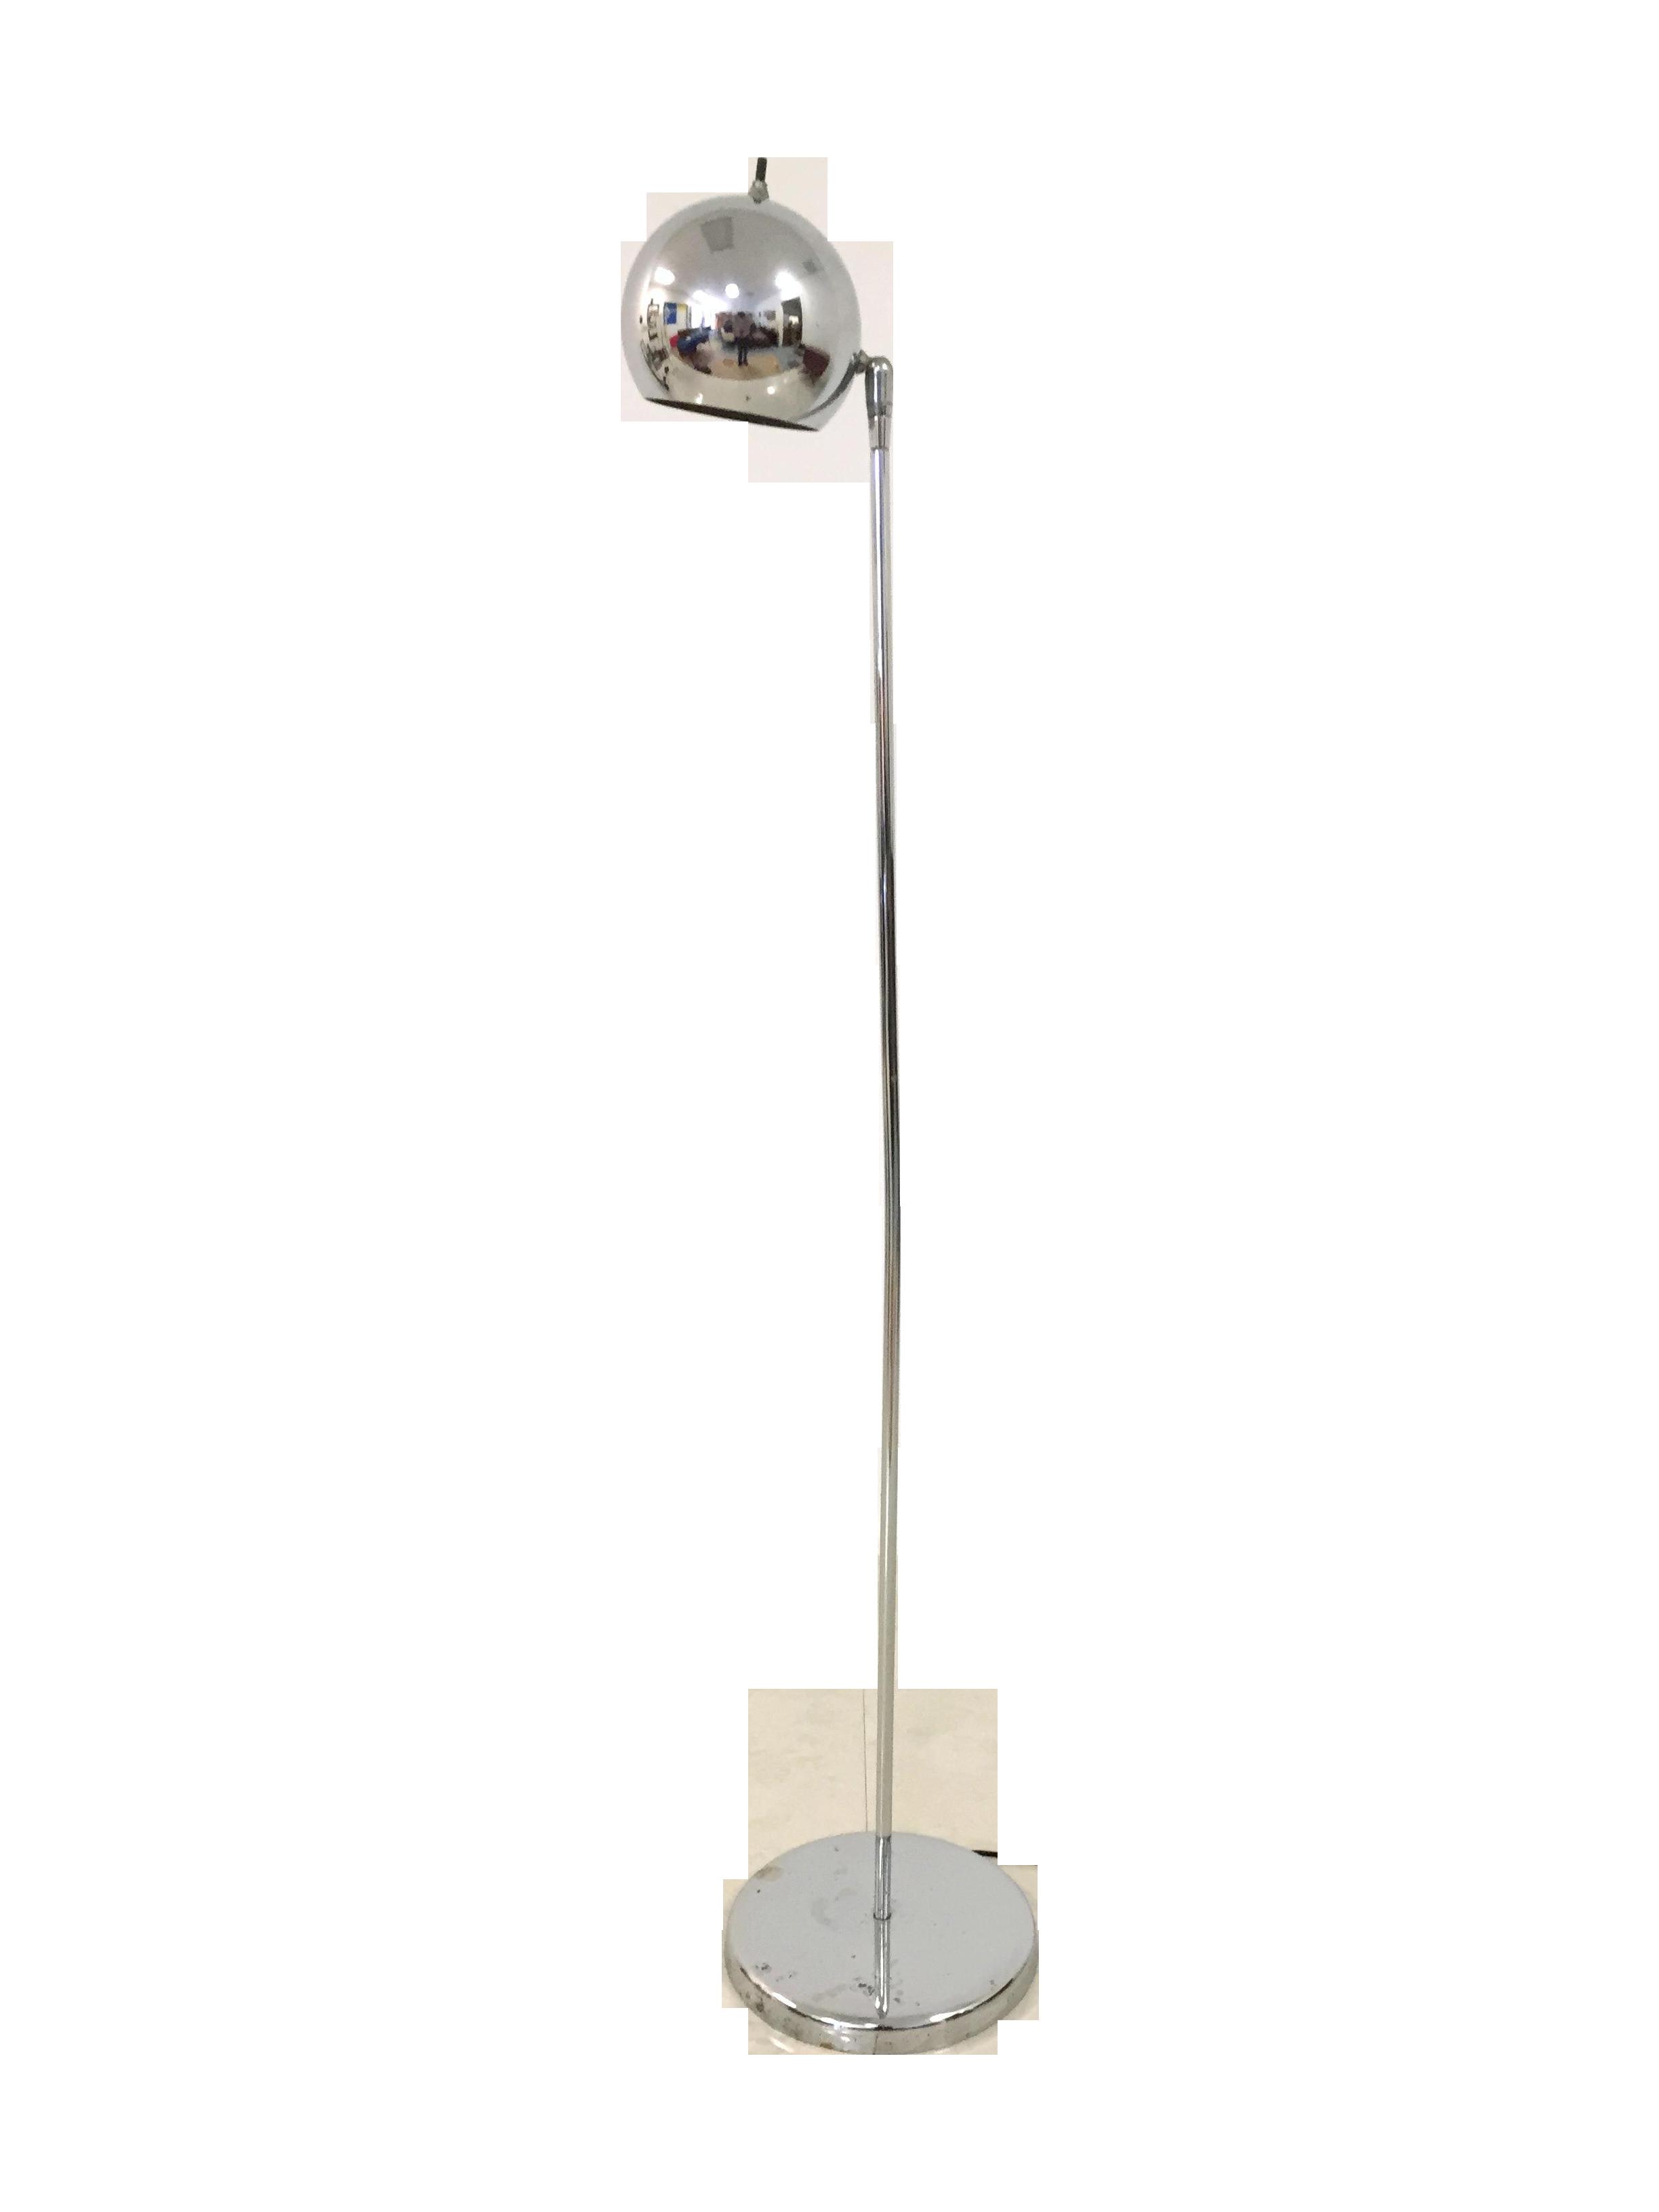 Vintage sonneman kovacs style chrome floor lamp chairish aloadofball Images